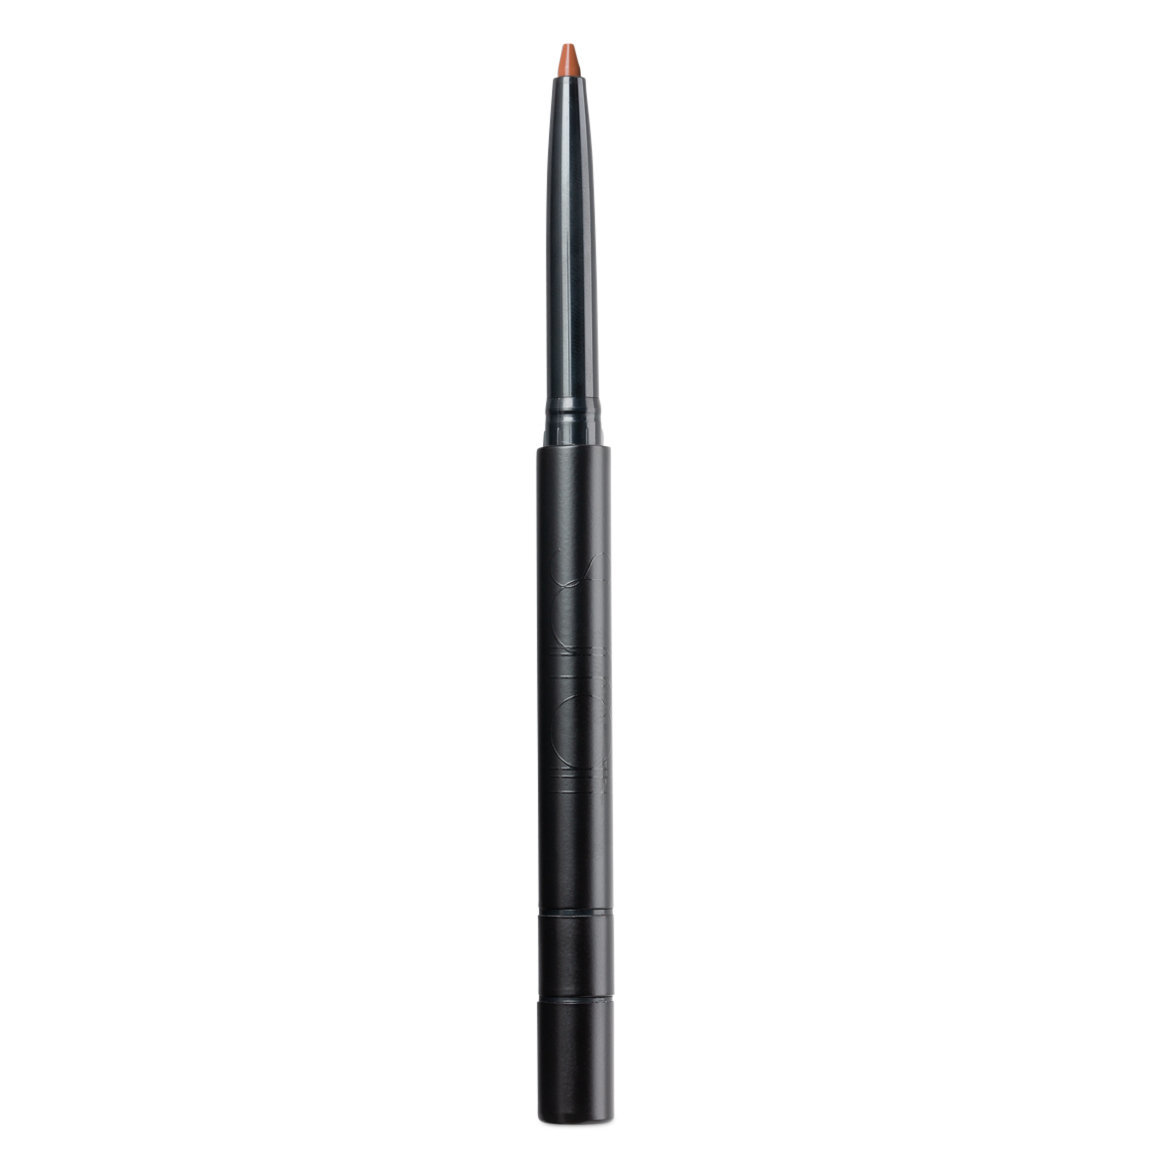 Surratt Beauty Moderniste Lip Pencil Tendre Basier